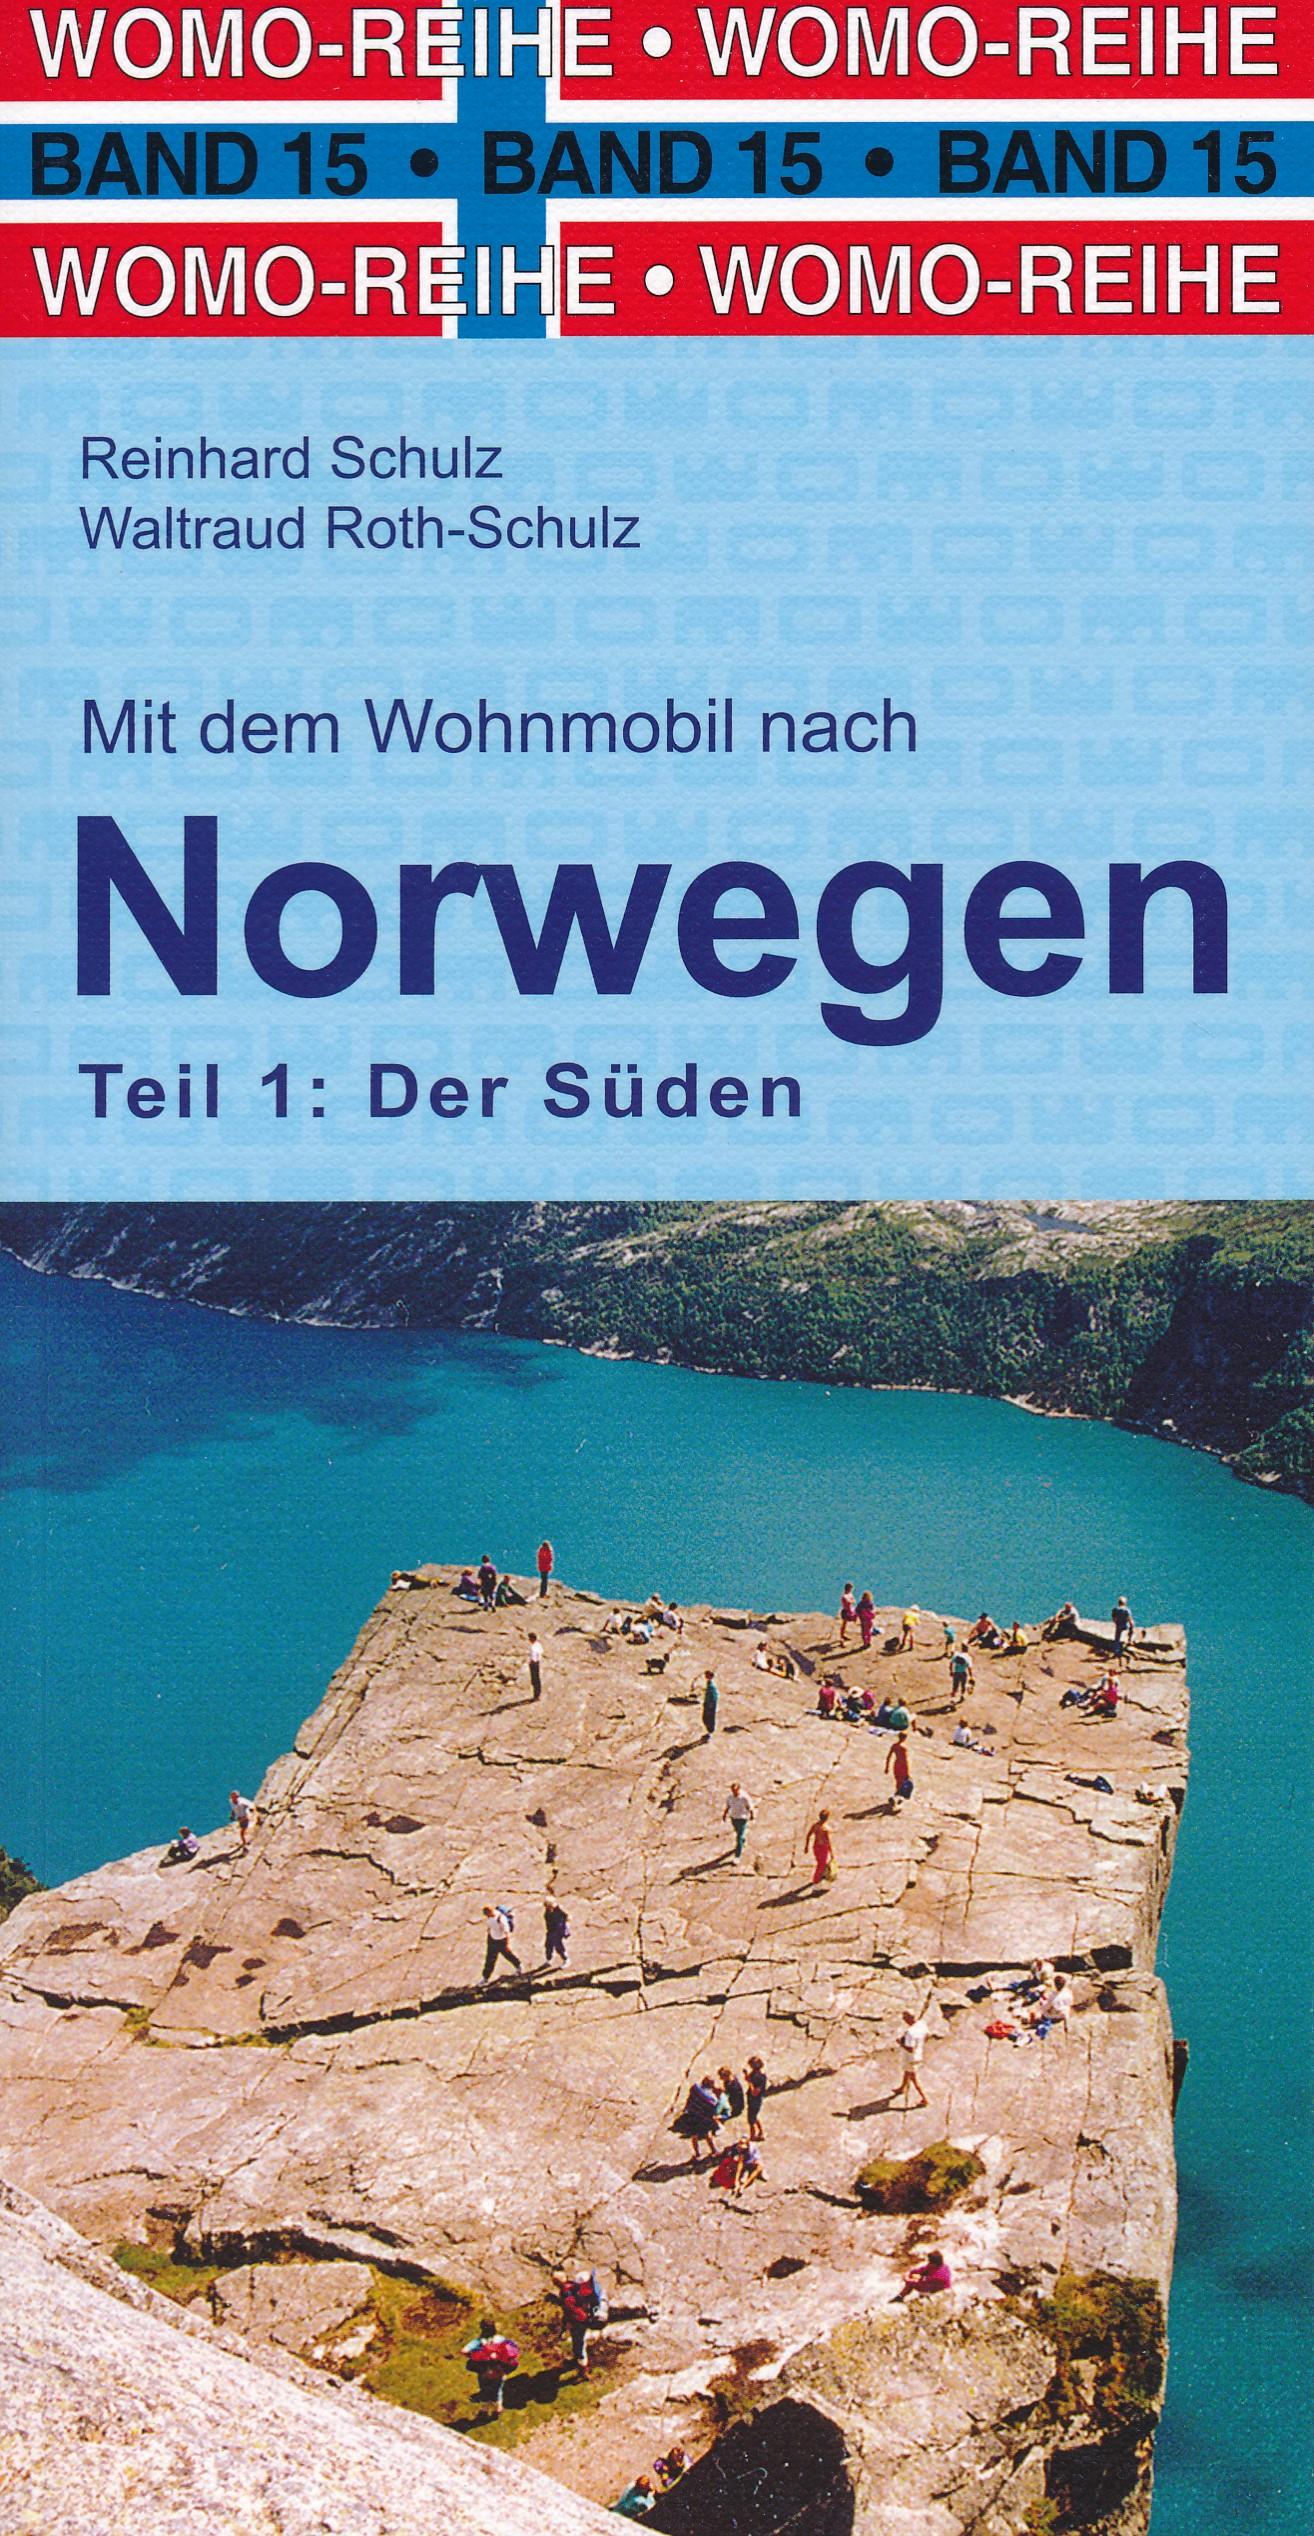 Opruiming - Campergids Mit dem Wohnmobil nach Süd-Norwegen - zuid Noorwegen   WOMO verlag de zwerver